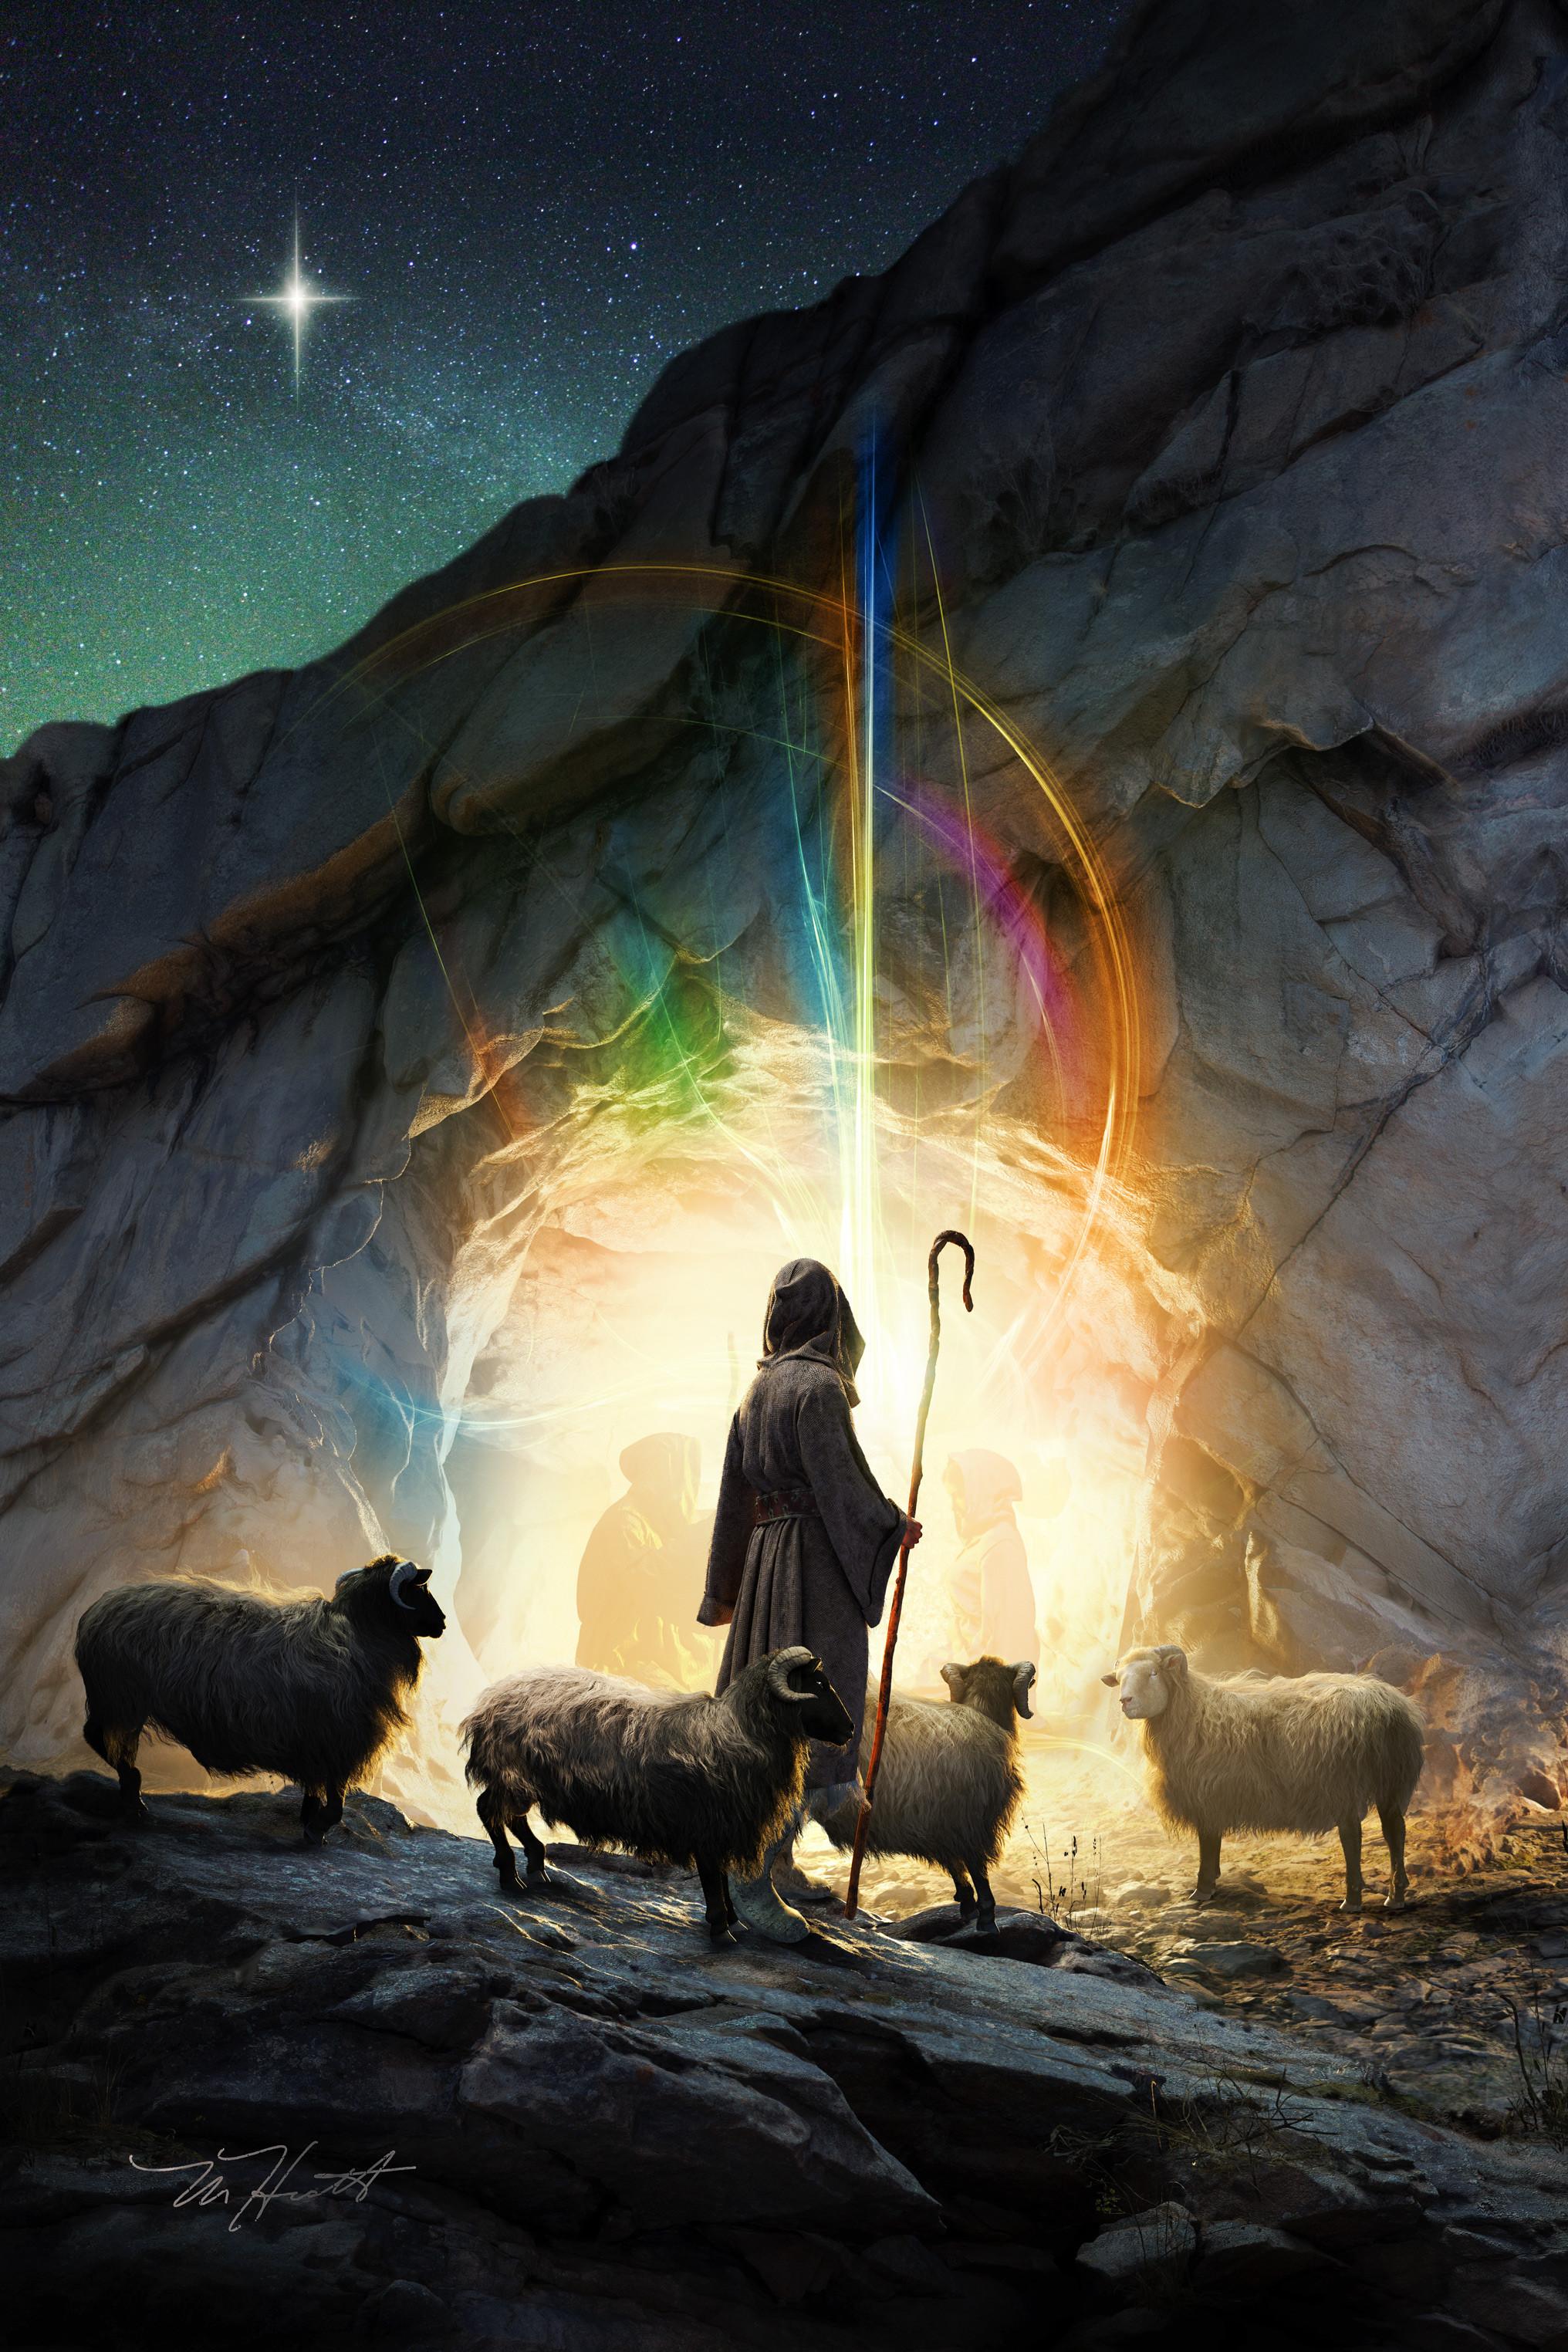 Final Art - The Arrival